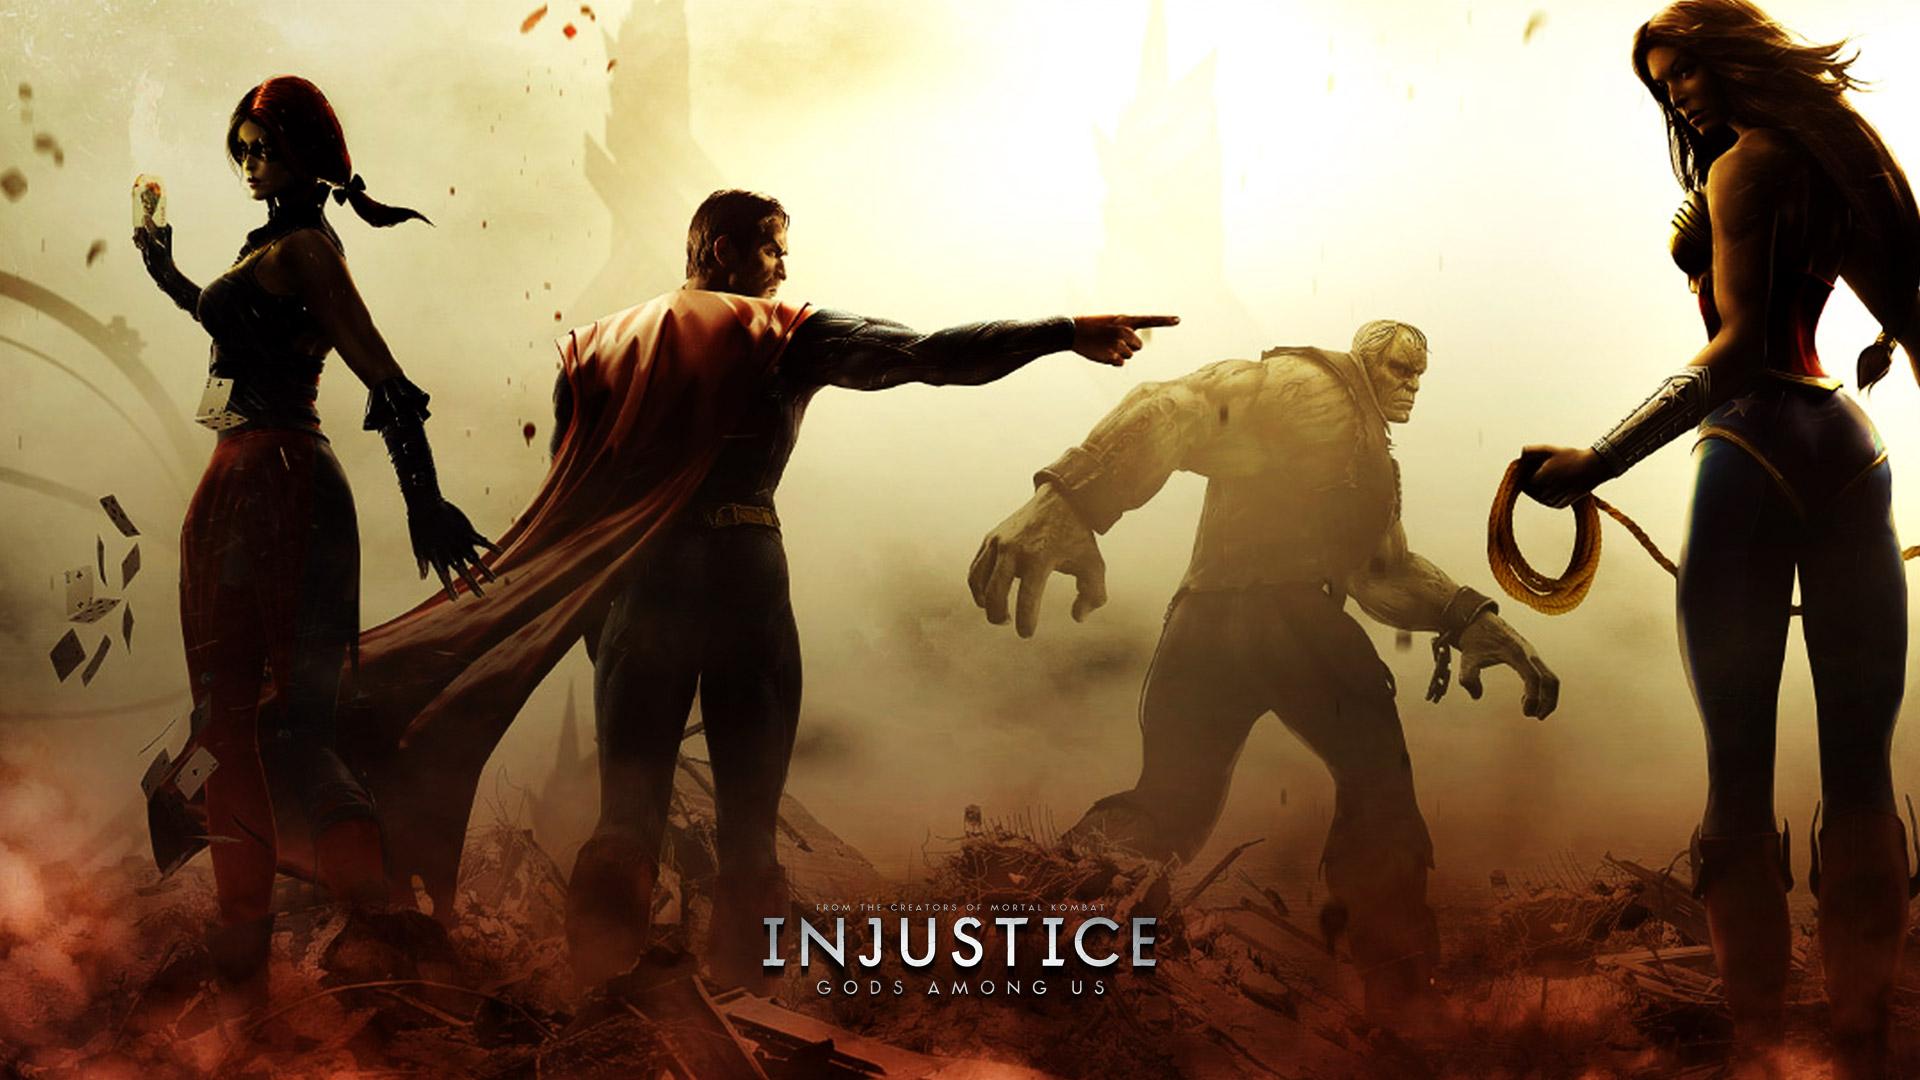 Injustice Gods Among Us Wallpaper 14